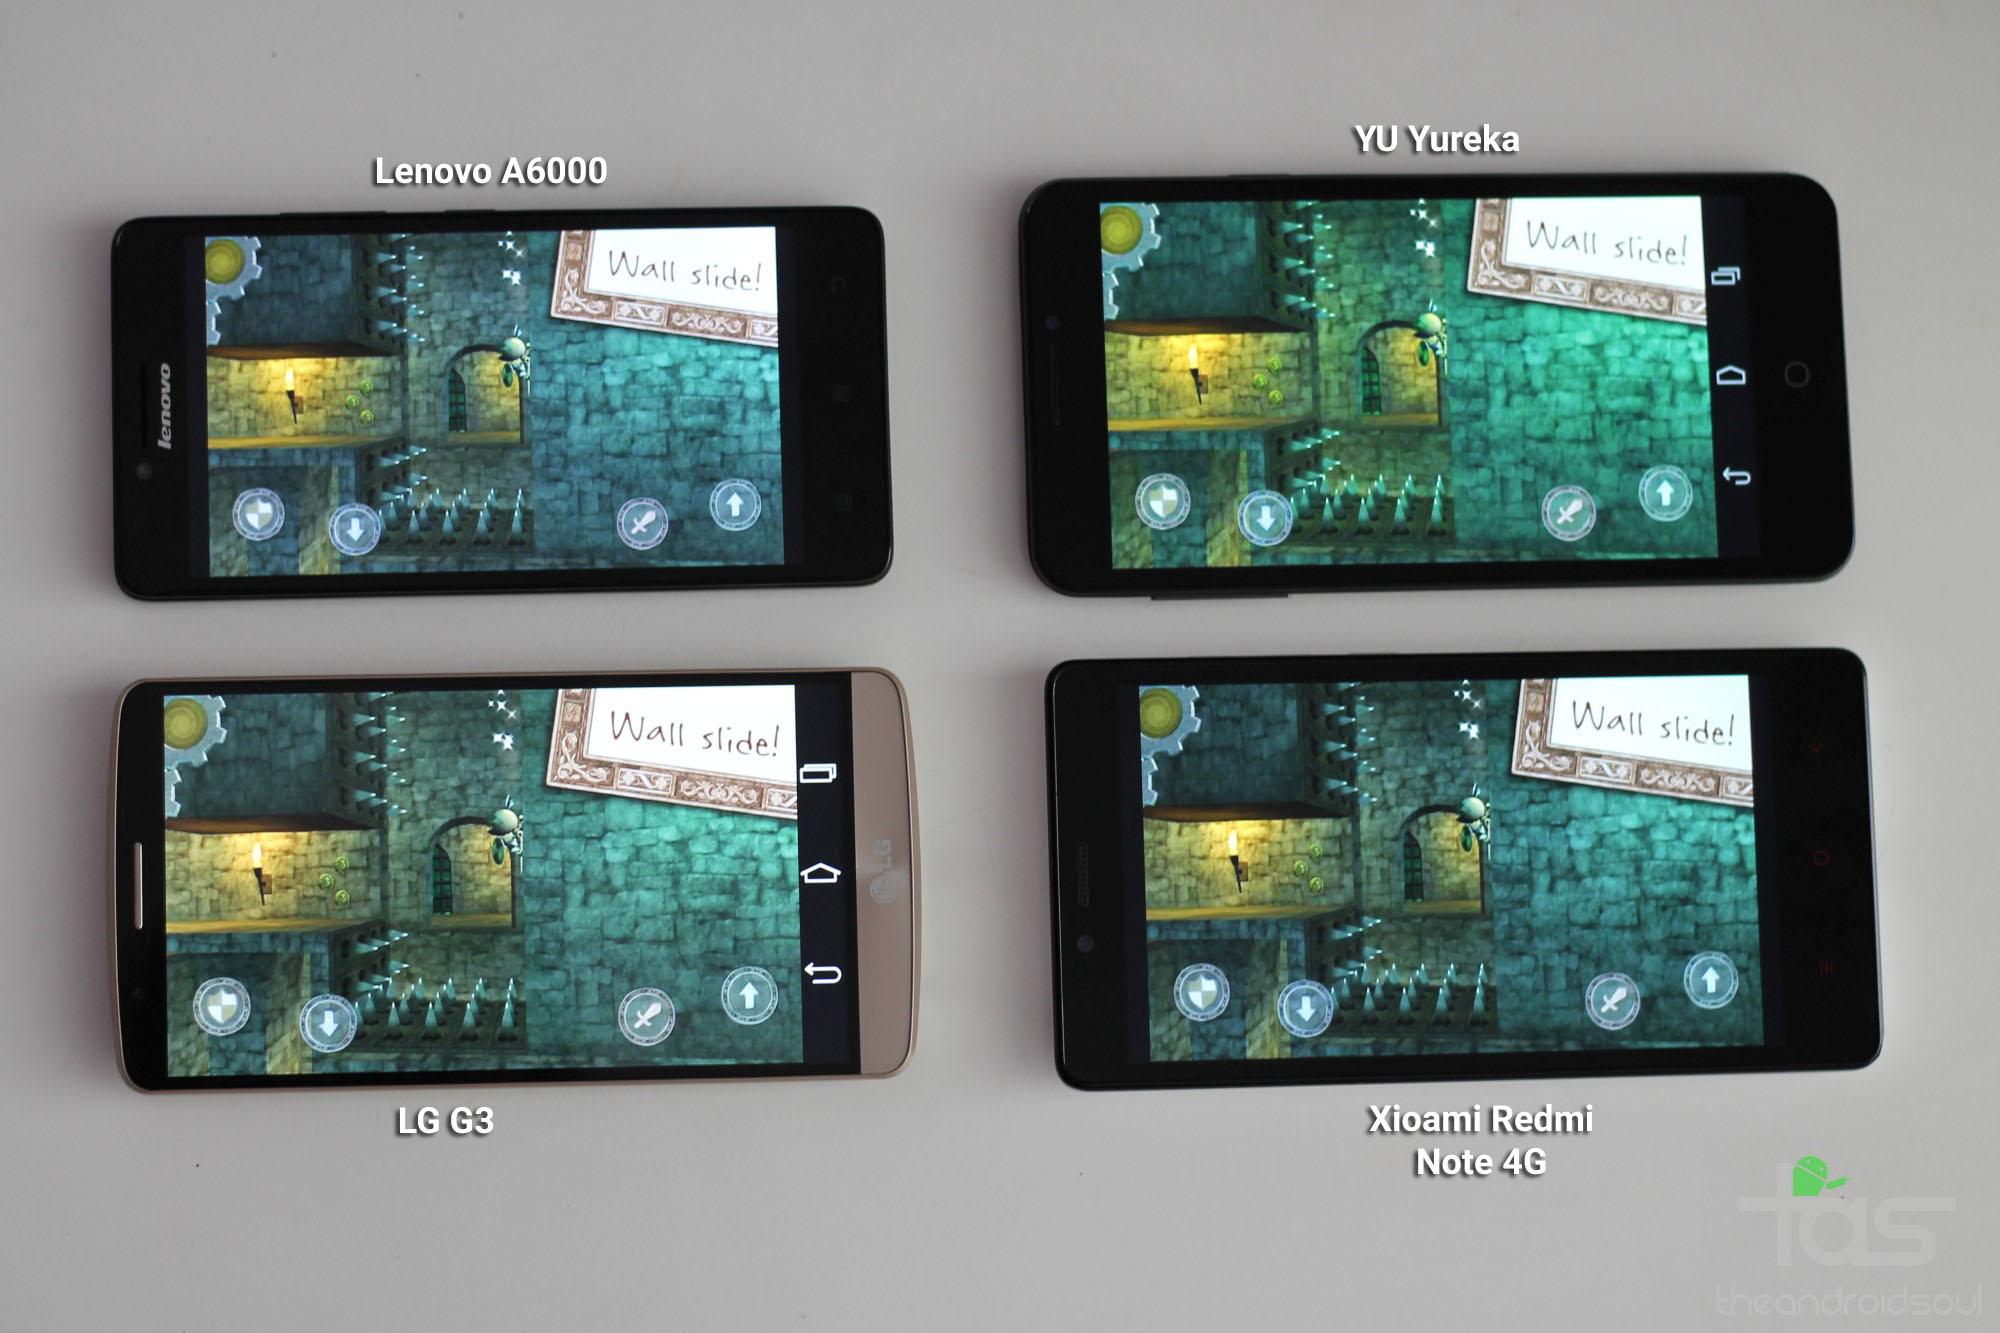 Display-Comparison-Lenovo-A6000-Review-5